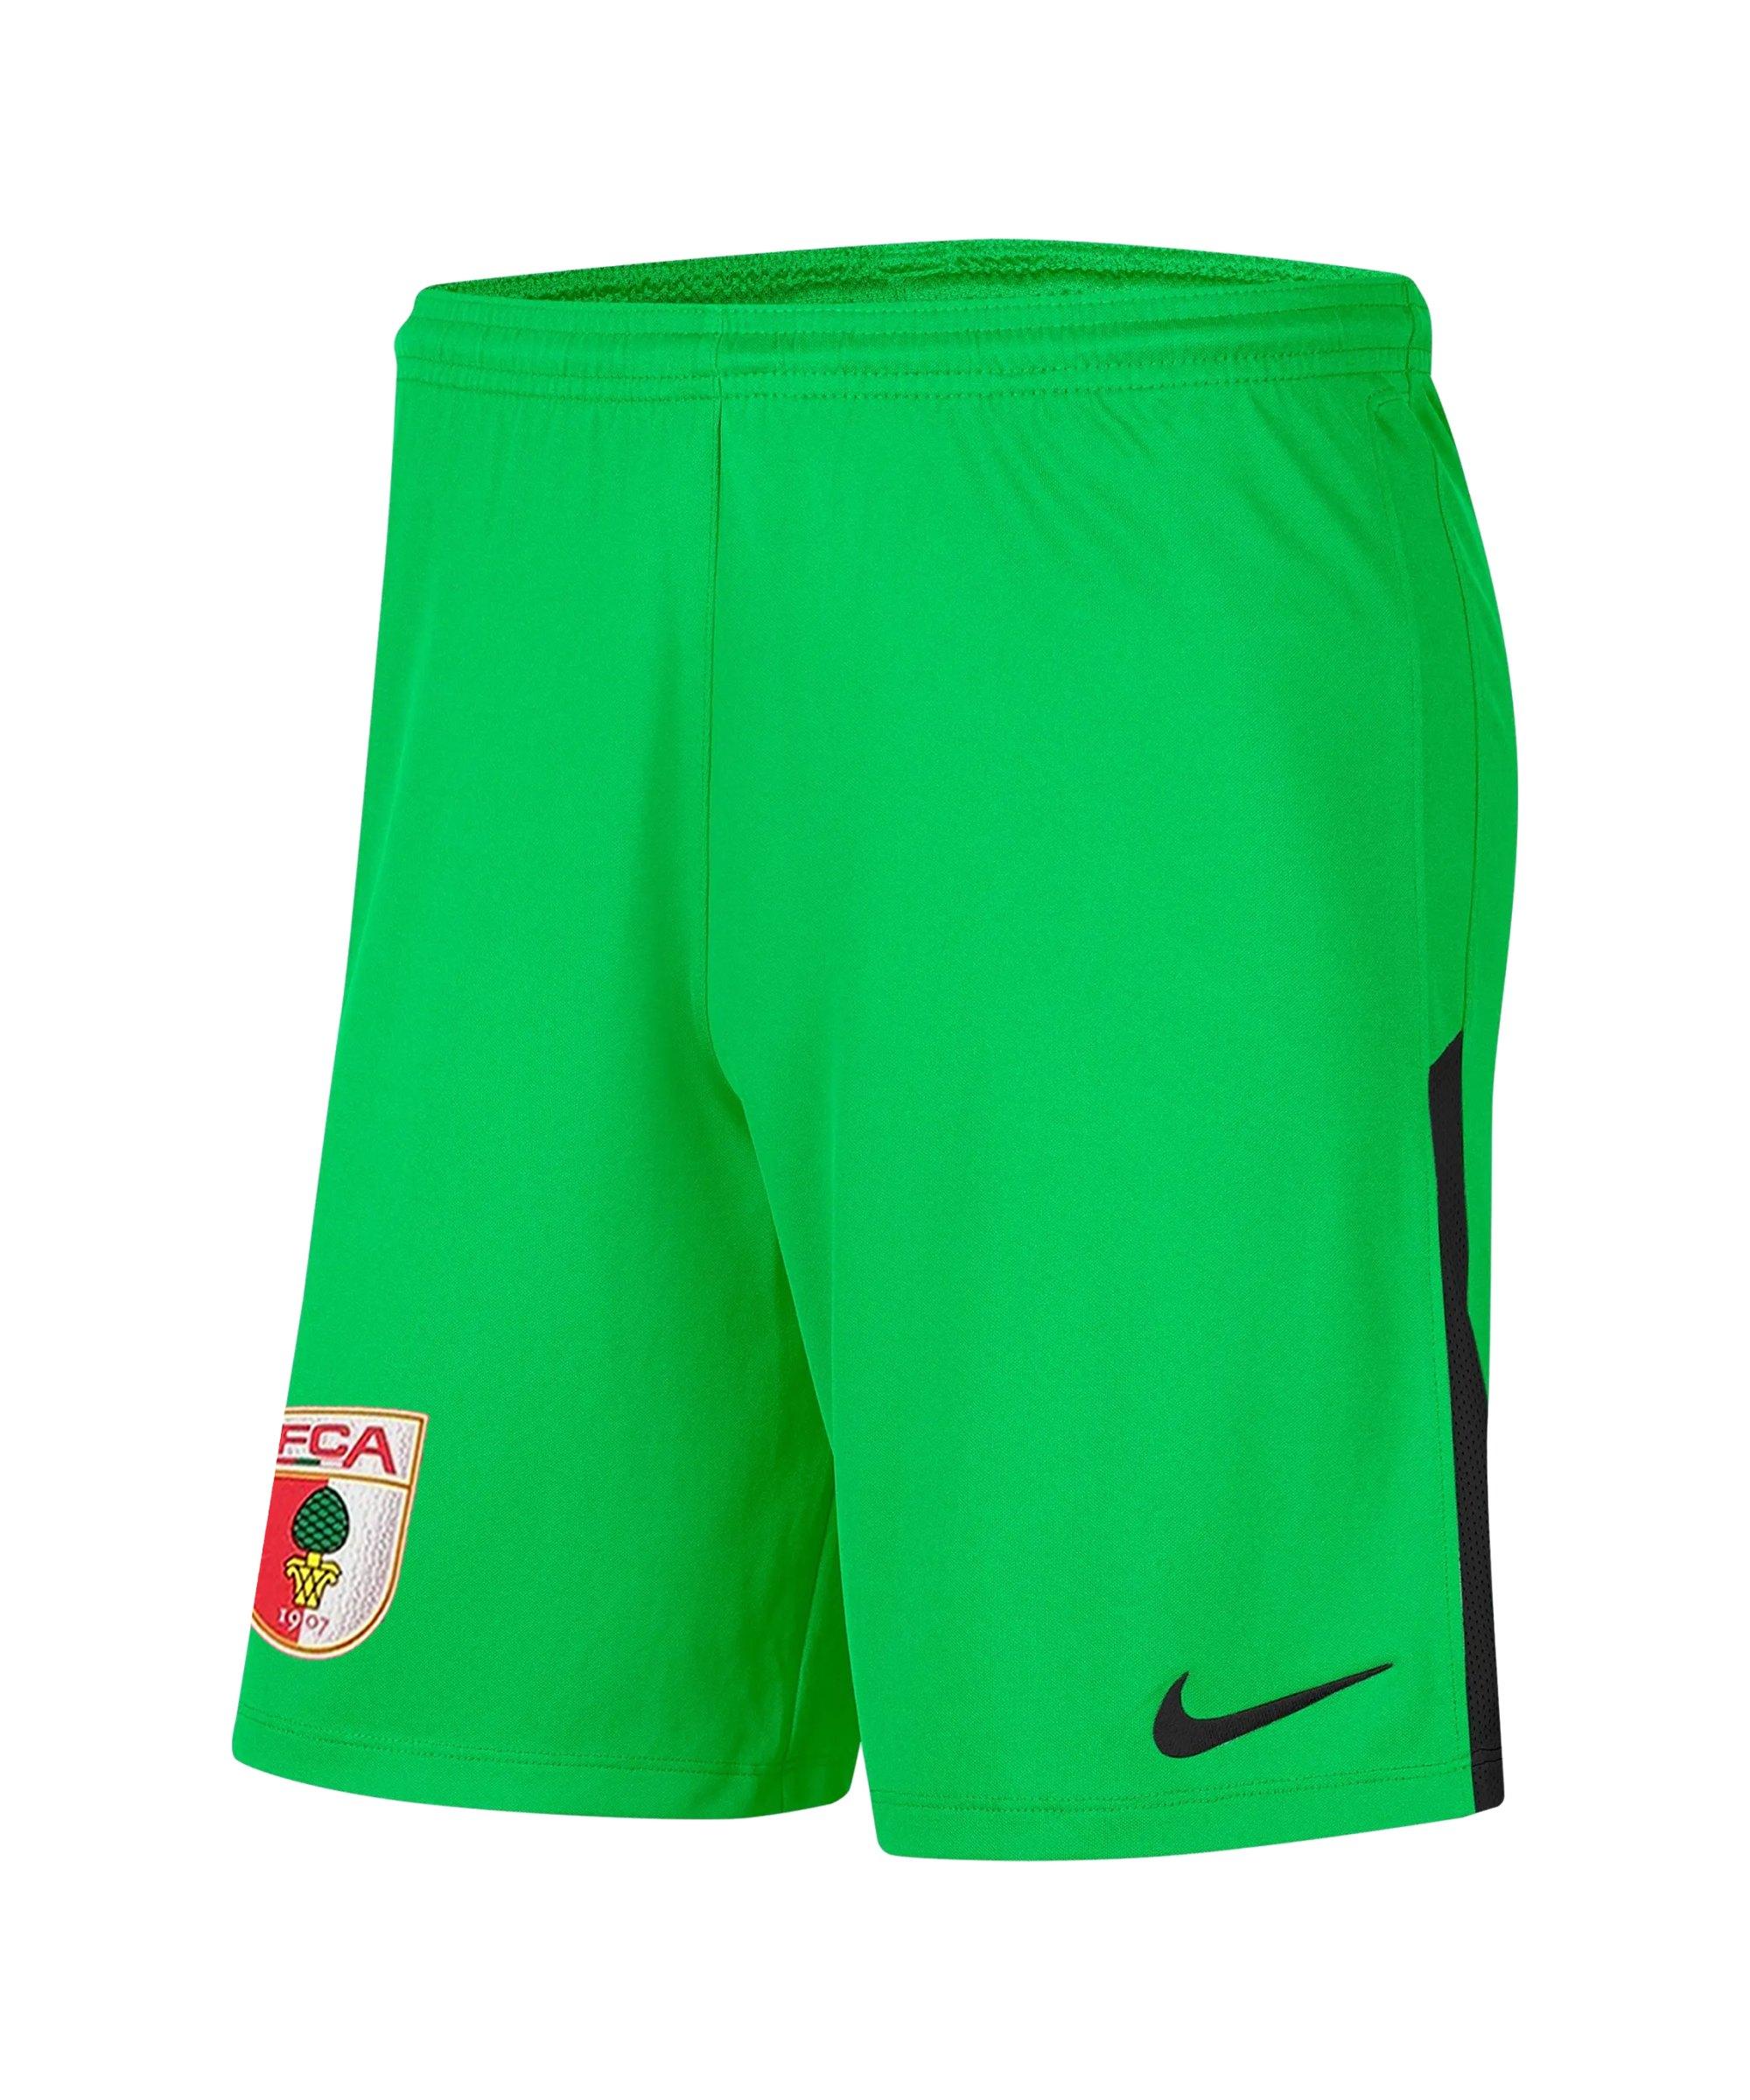 Nike FC Augsburg Torwartshort 2021/2022 F329 - gruen